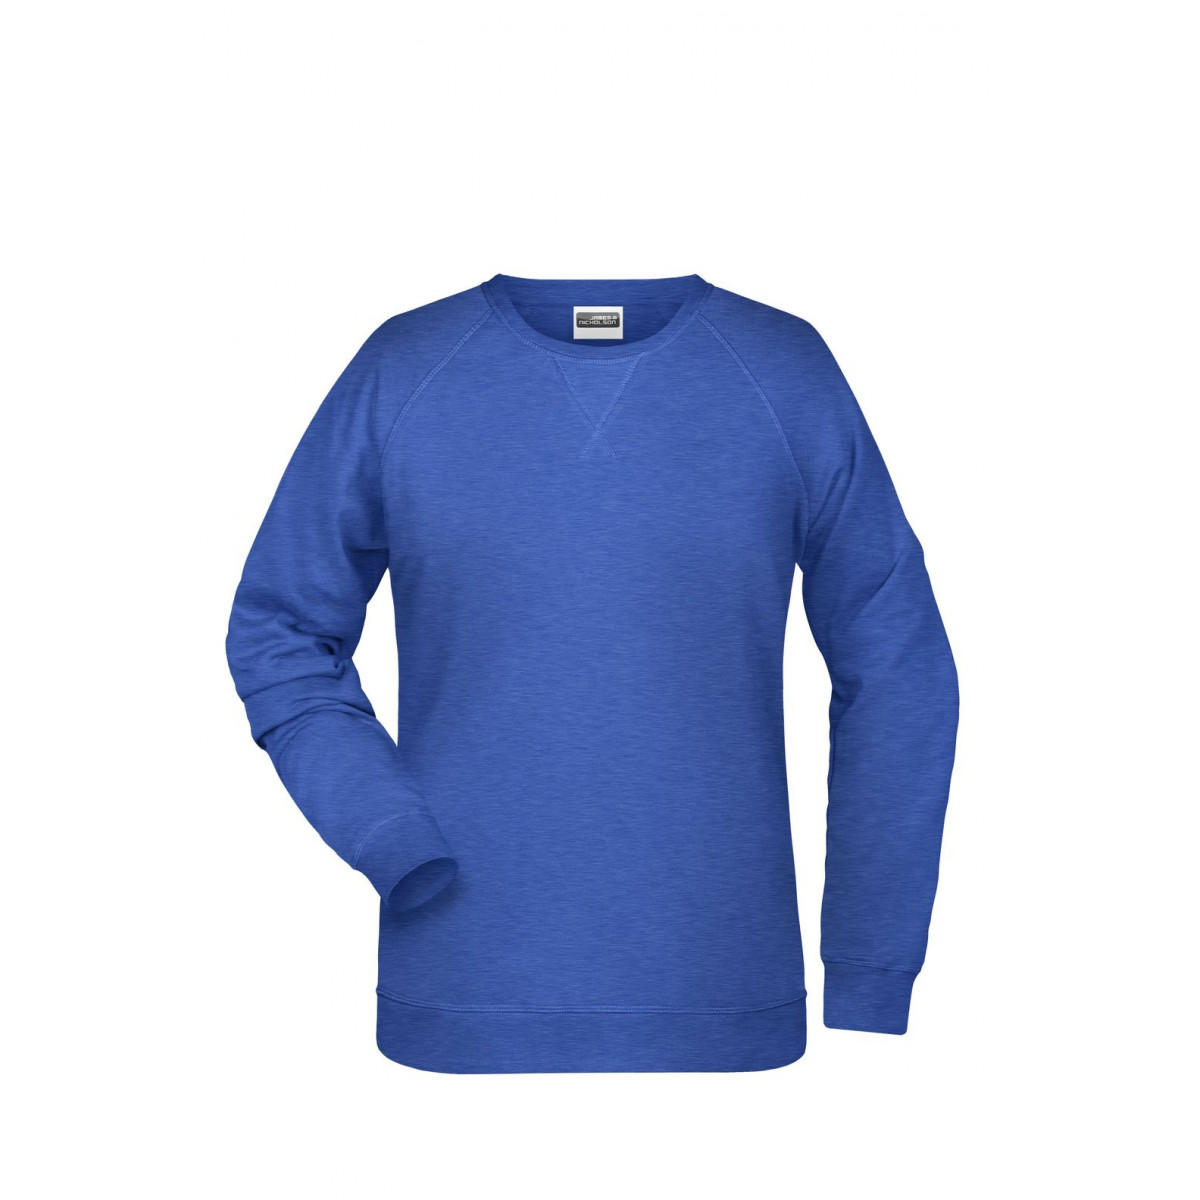 Толстовка женская 8021 Ladies Sweat - Ярко-синий меоанж